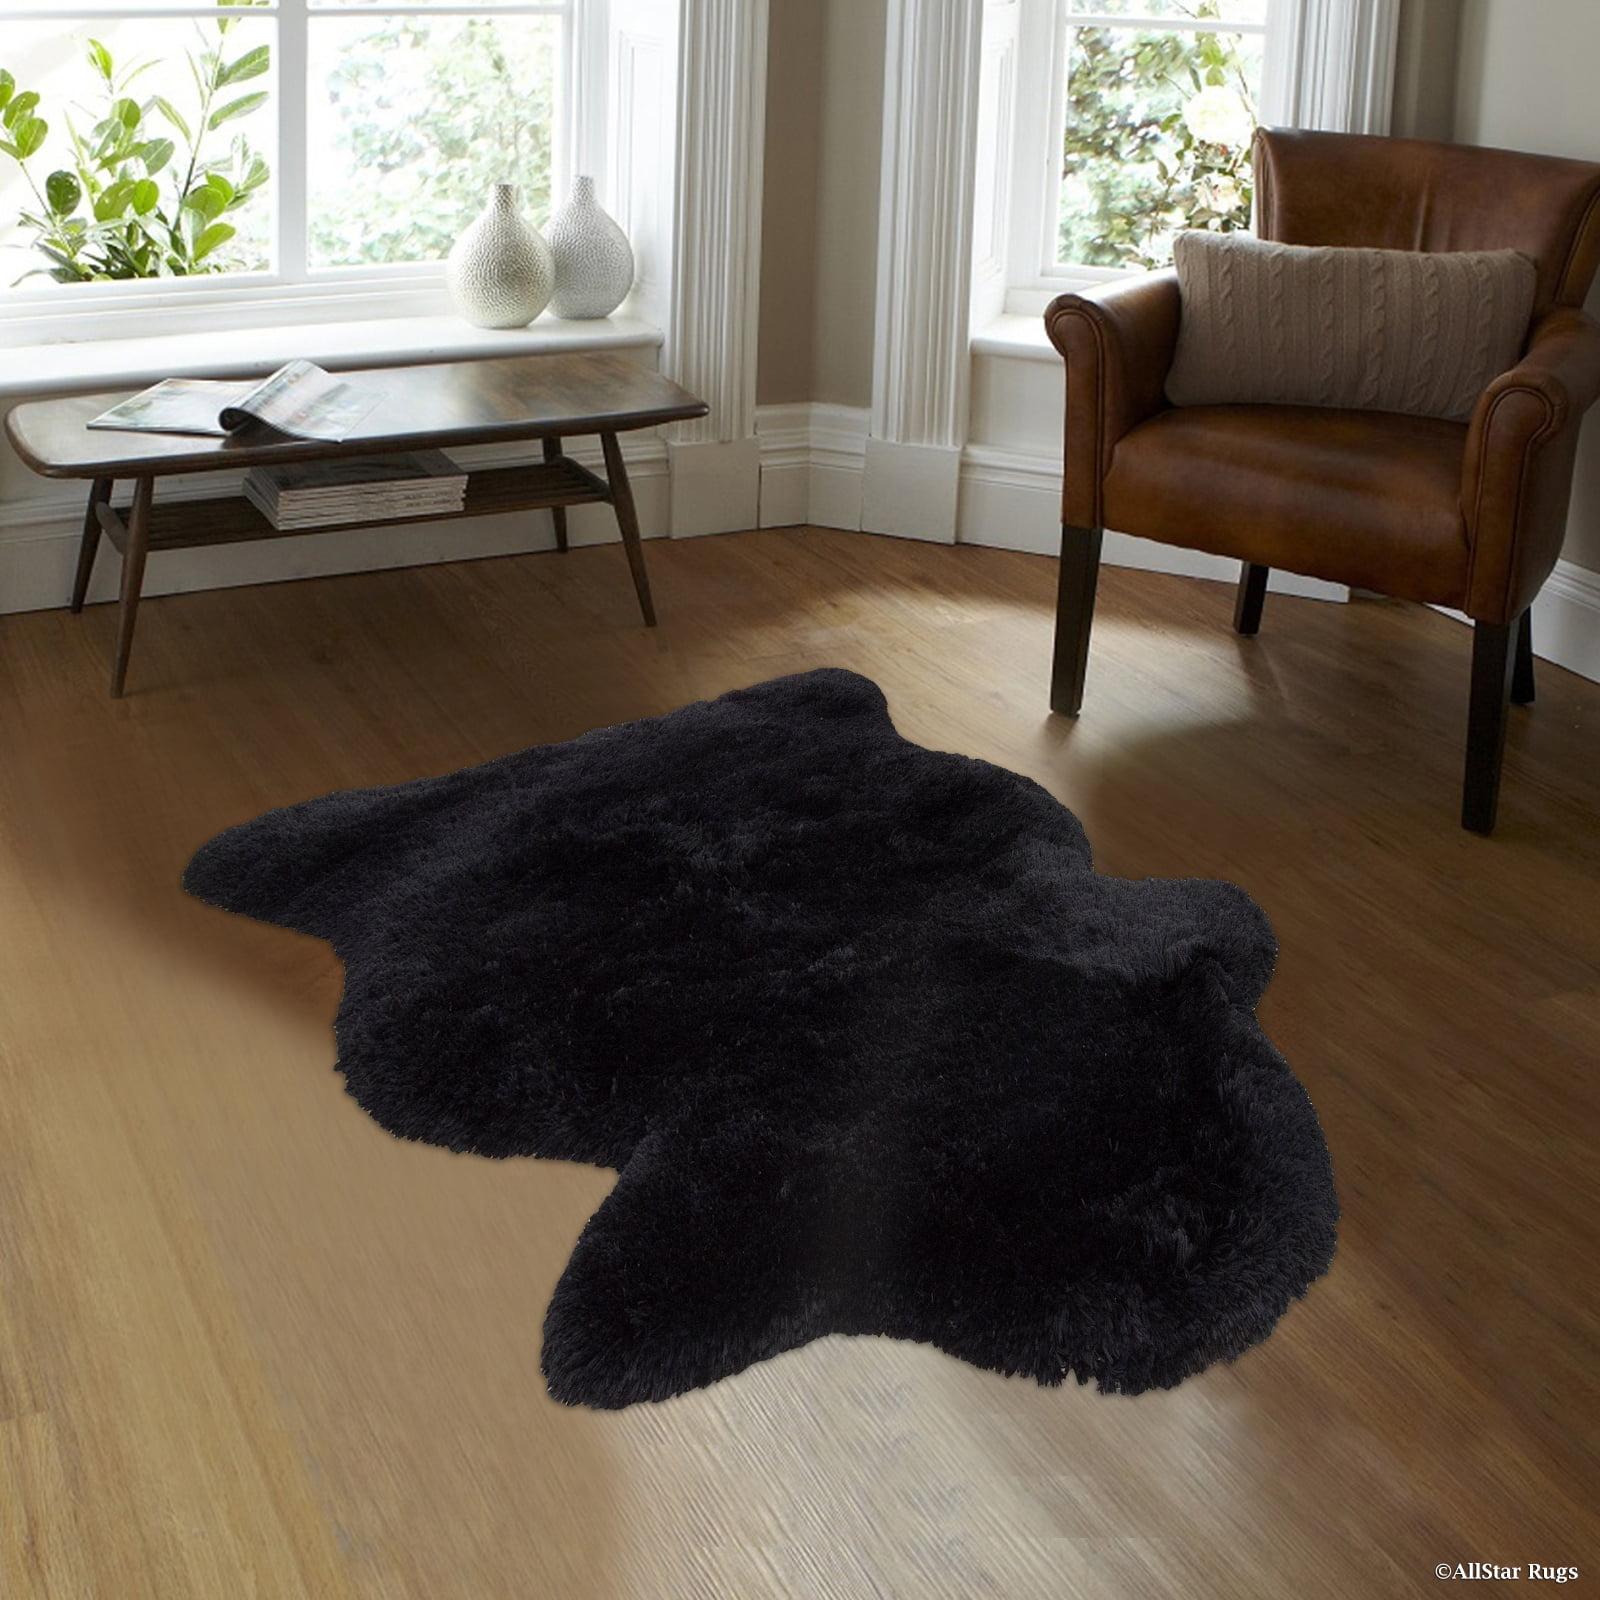 Allstar Black Rug, High Quality Faux Sheep / Polar Bear S...